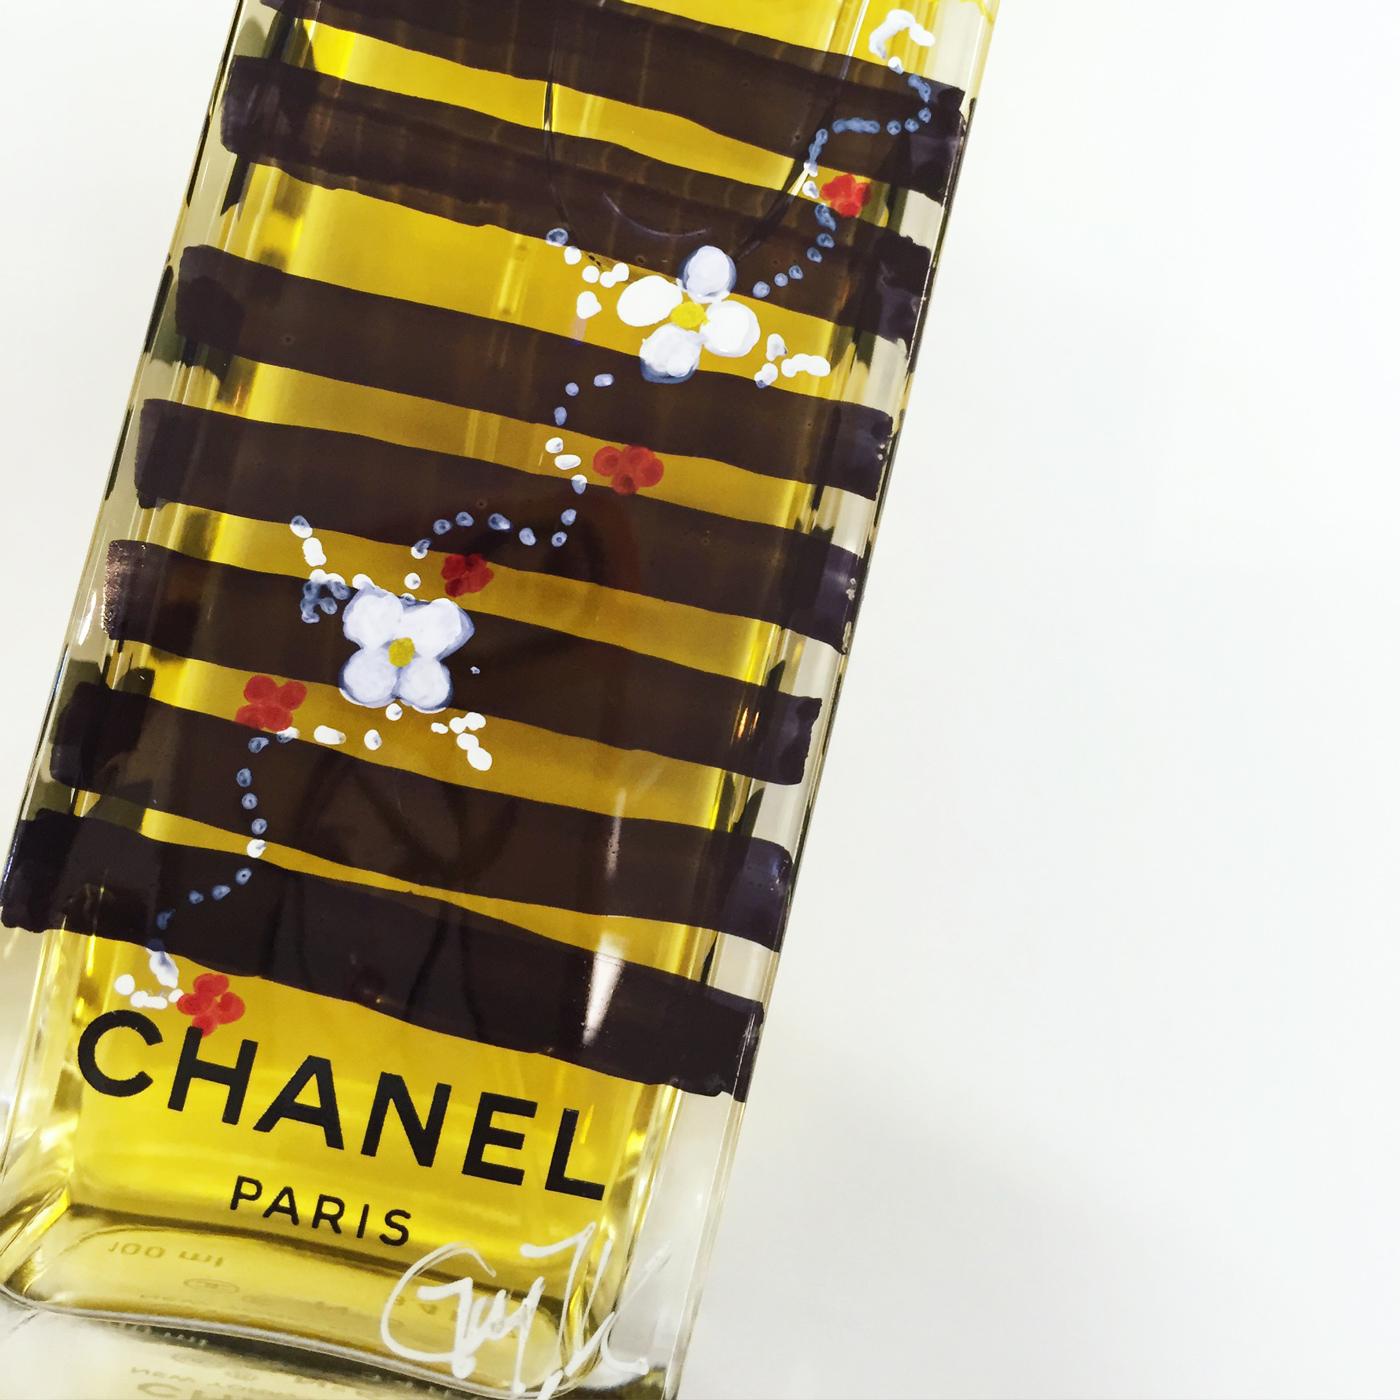 TAOS-Chanel-no5-illustration-bottle